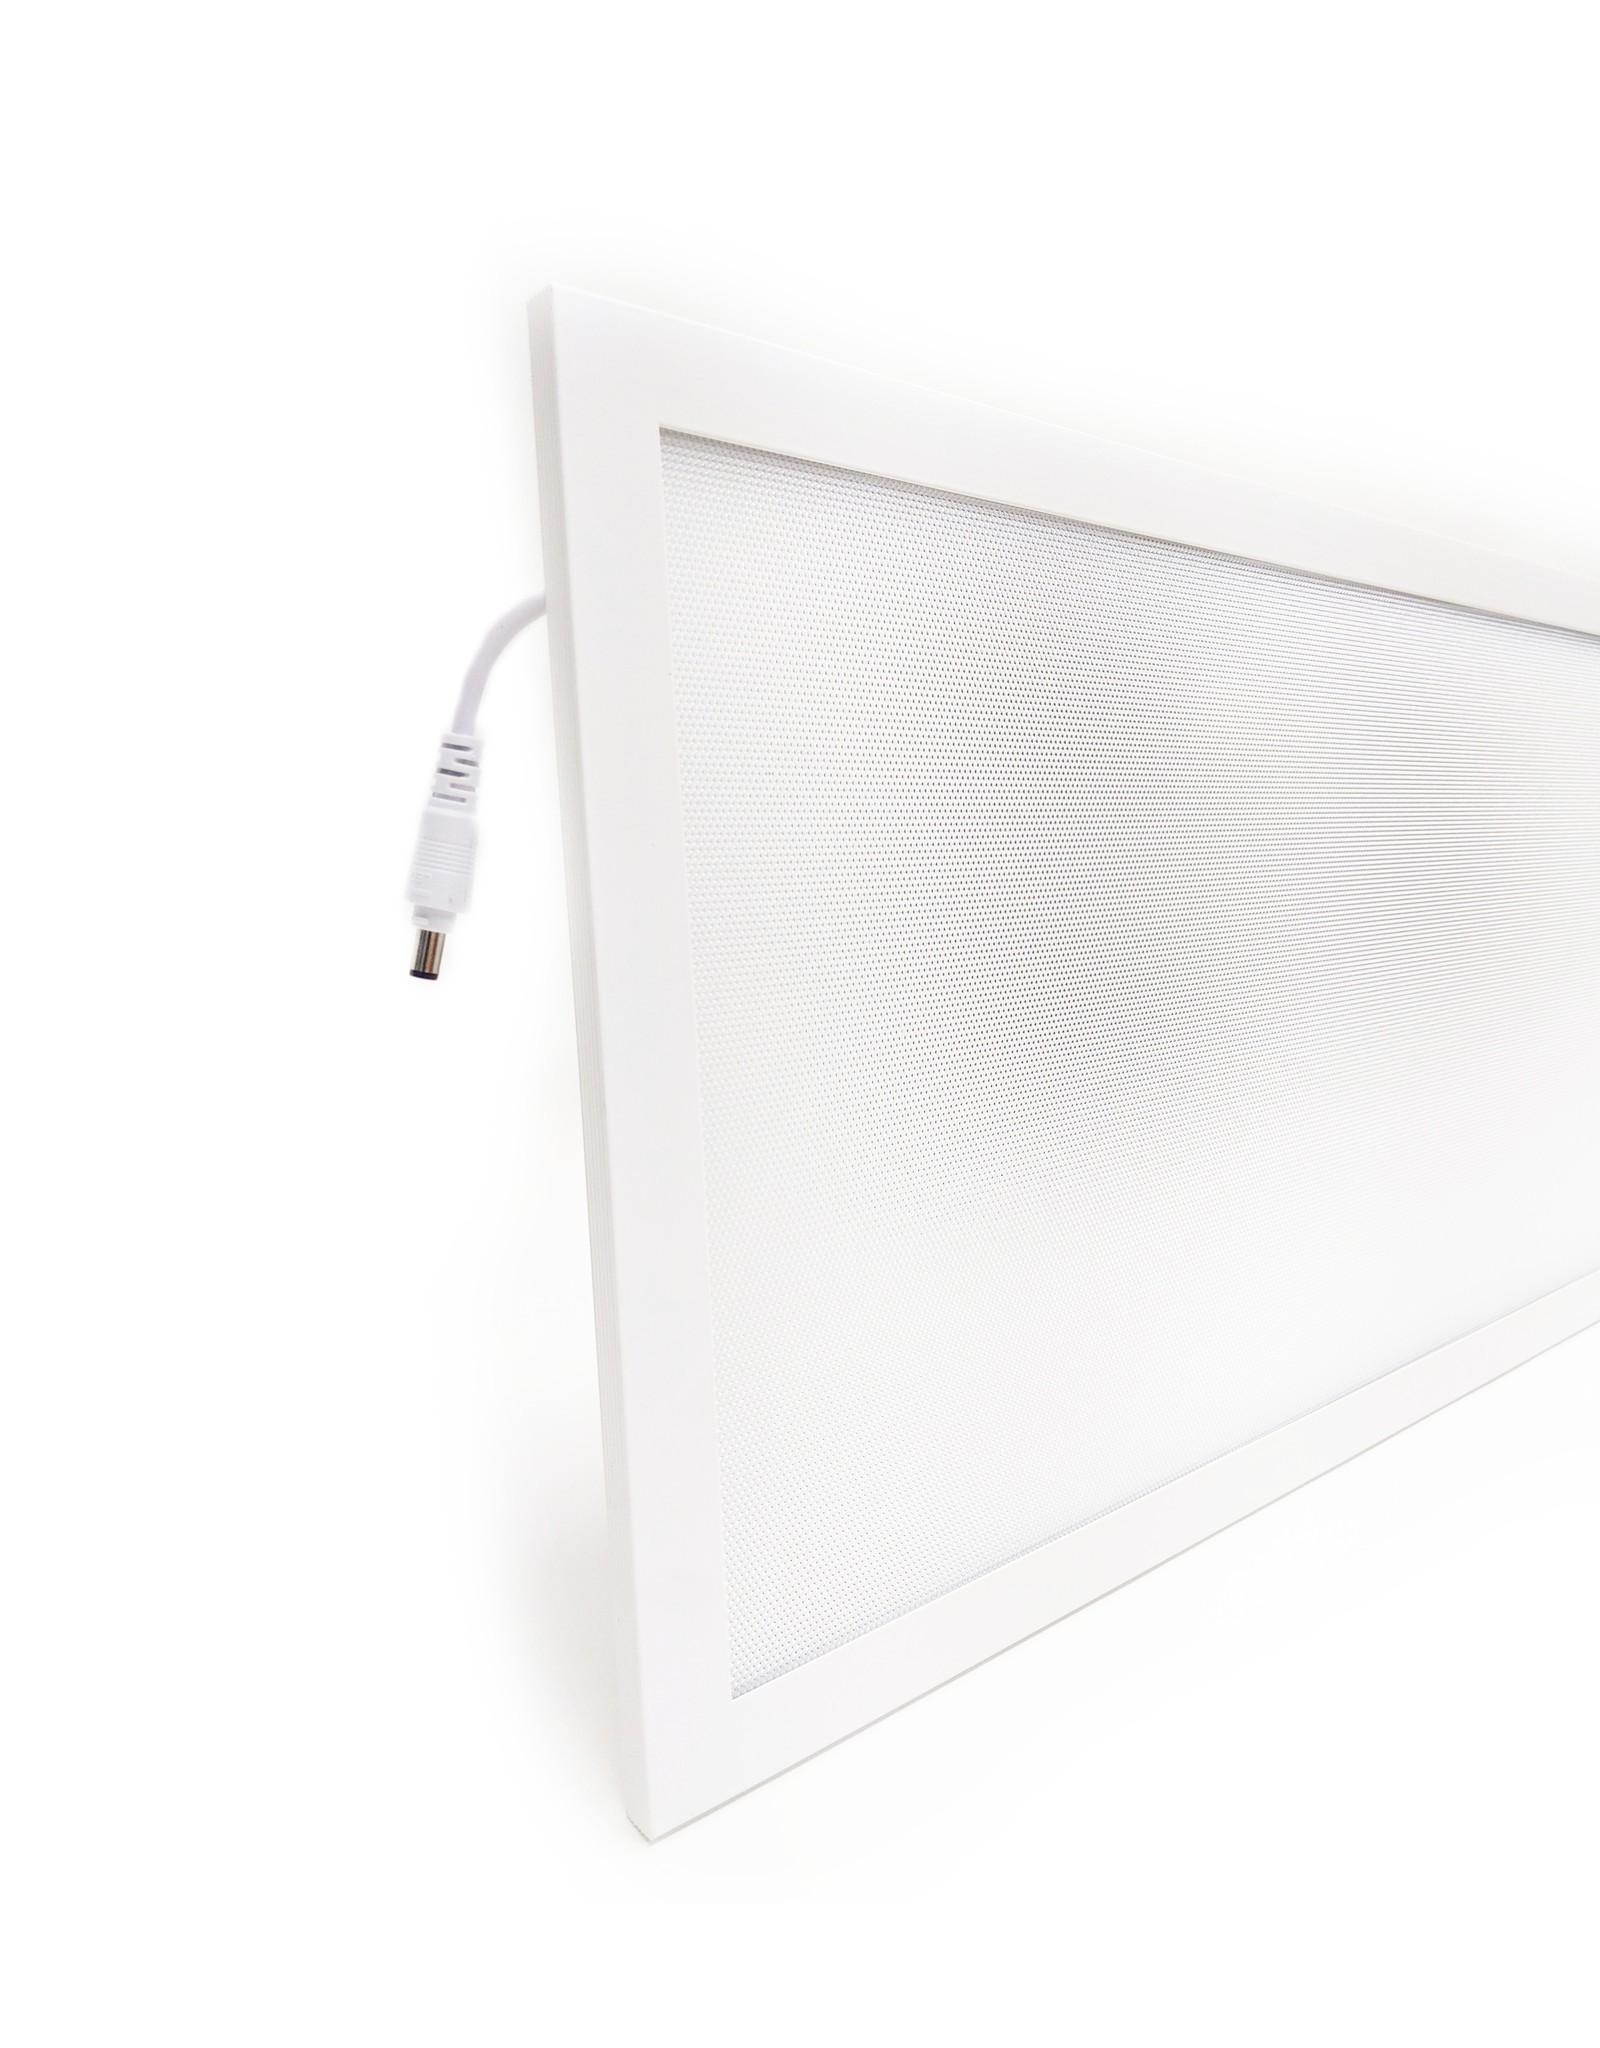 LedLed LED Panel Luxor Prisma UGR<19 30W 3000k